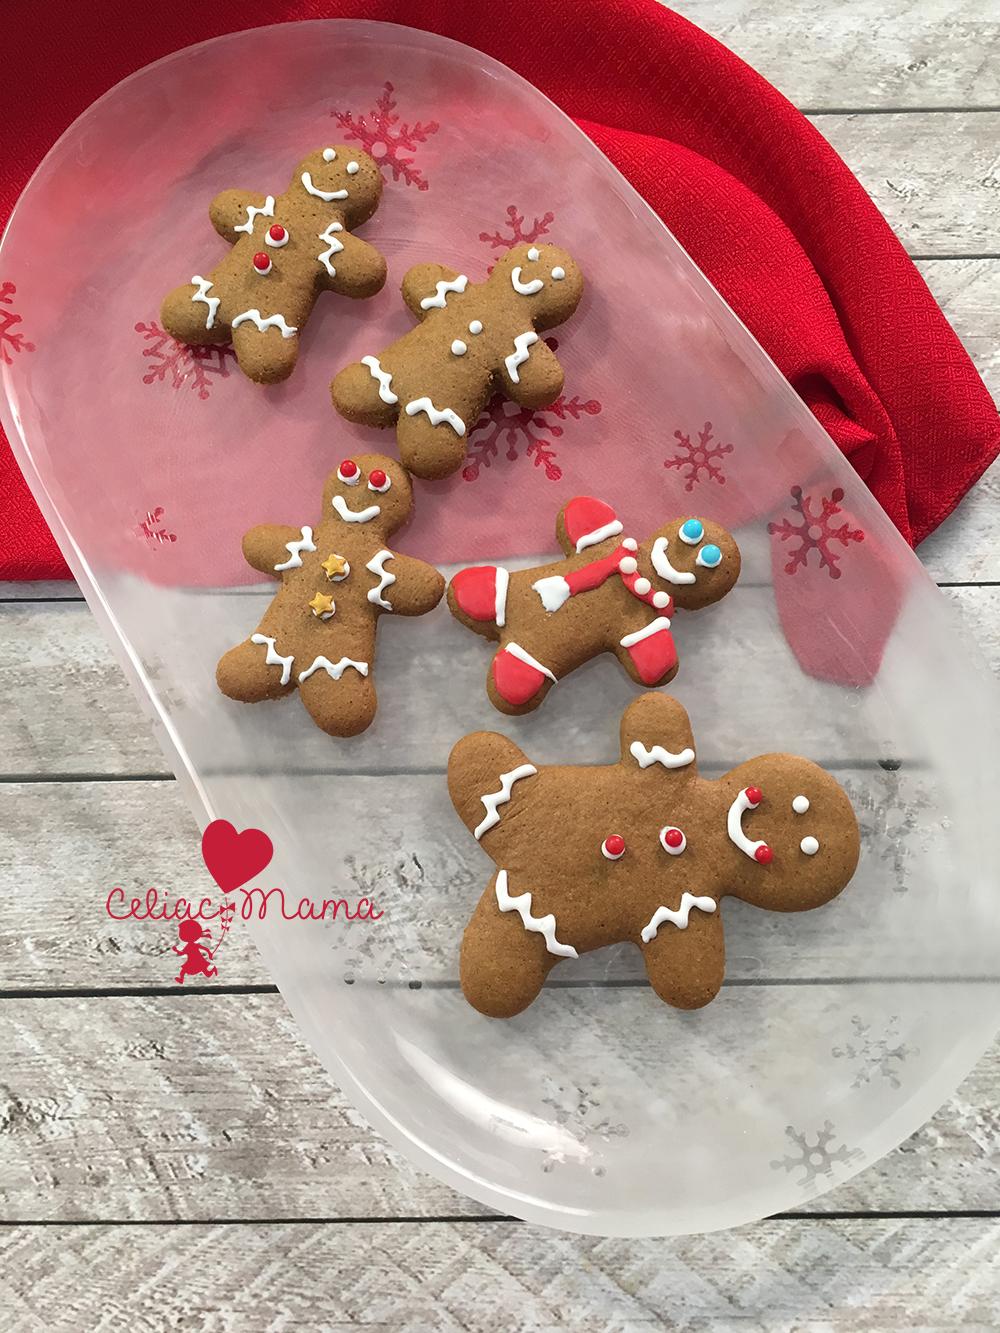 gluten-free-gingerbread-men-cookies-red-plate